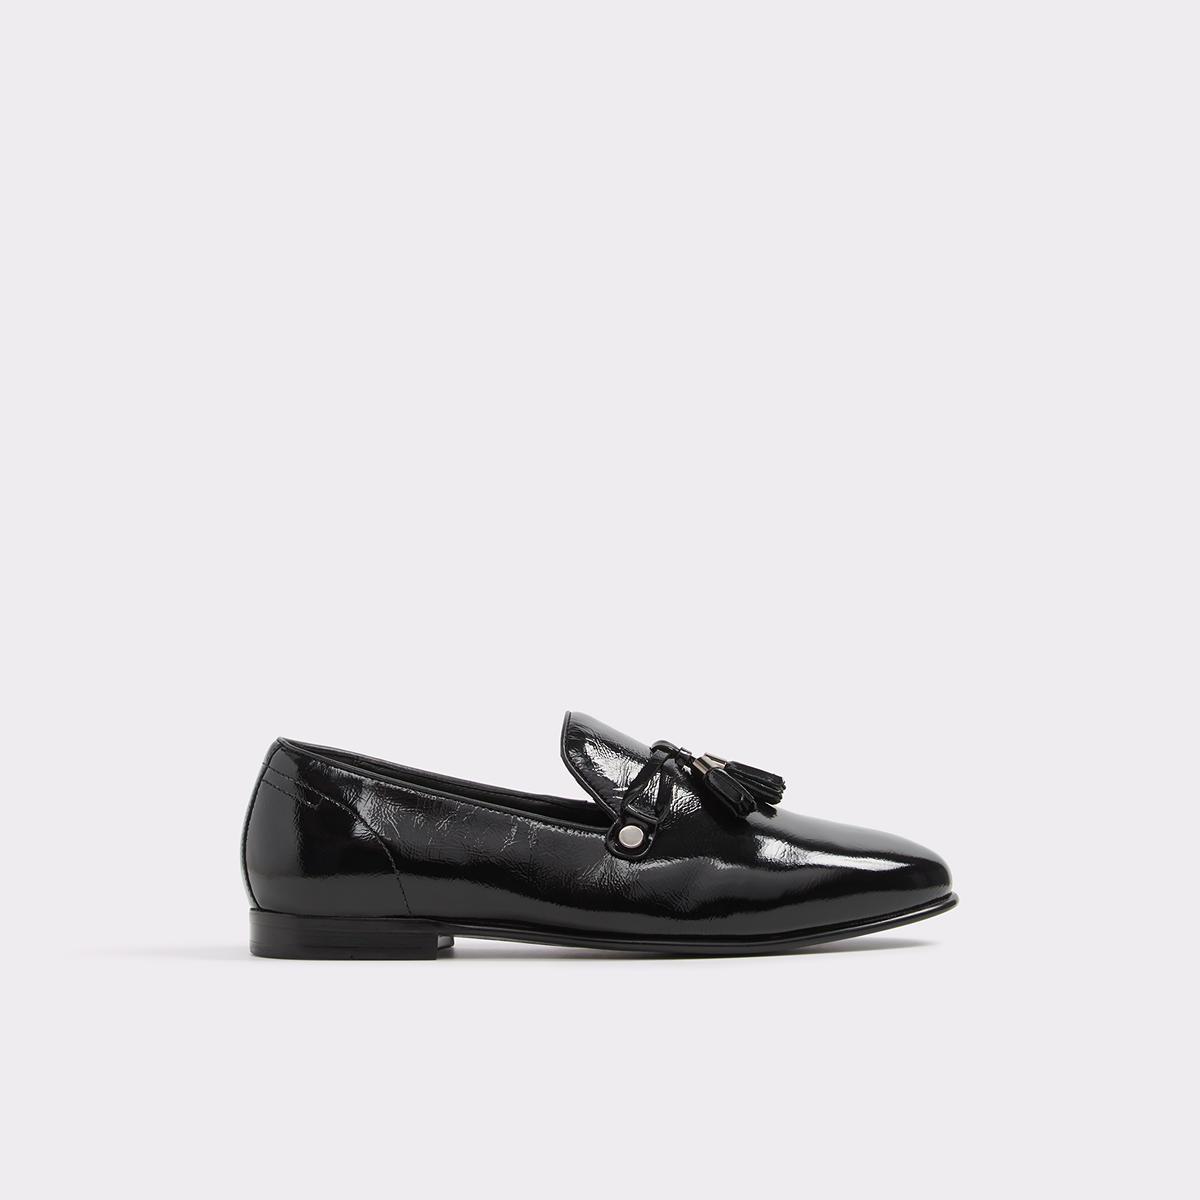 Mccrery Black Patent Men's Loafers | ALDO US at Aldo Shoes in Victor, NY | Tuggl